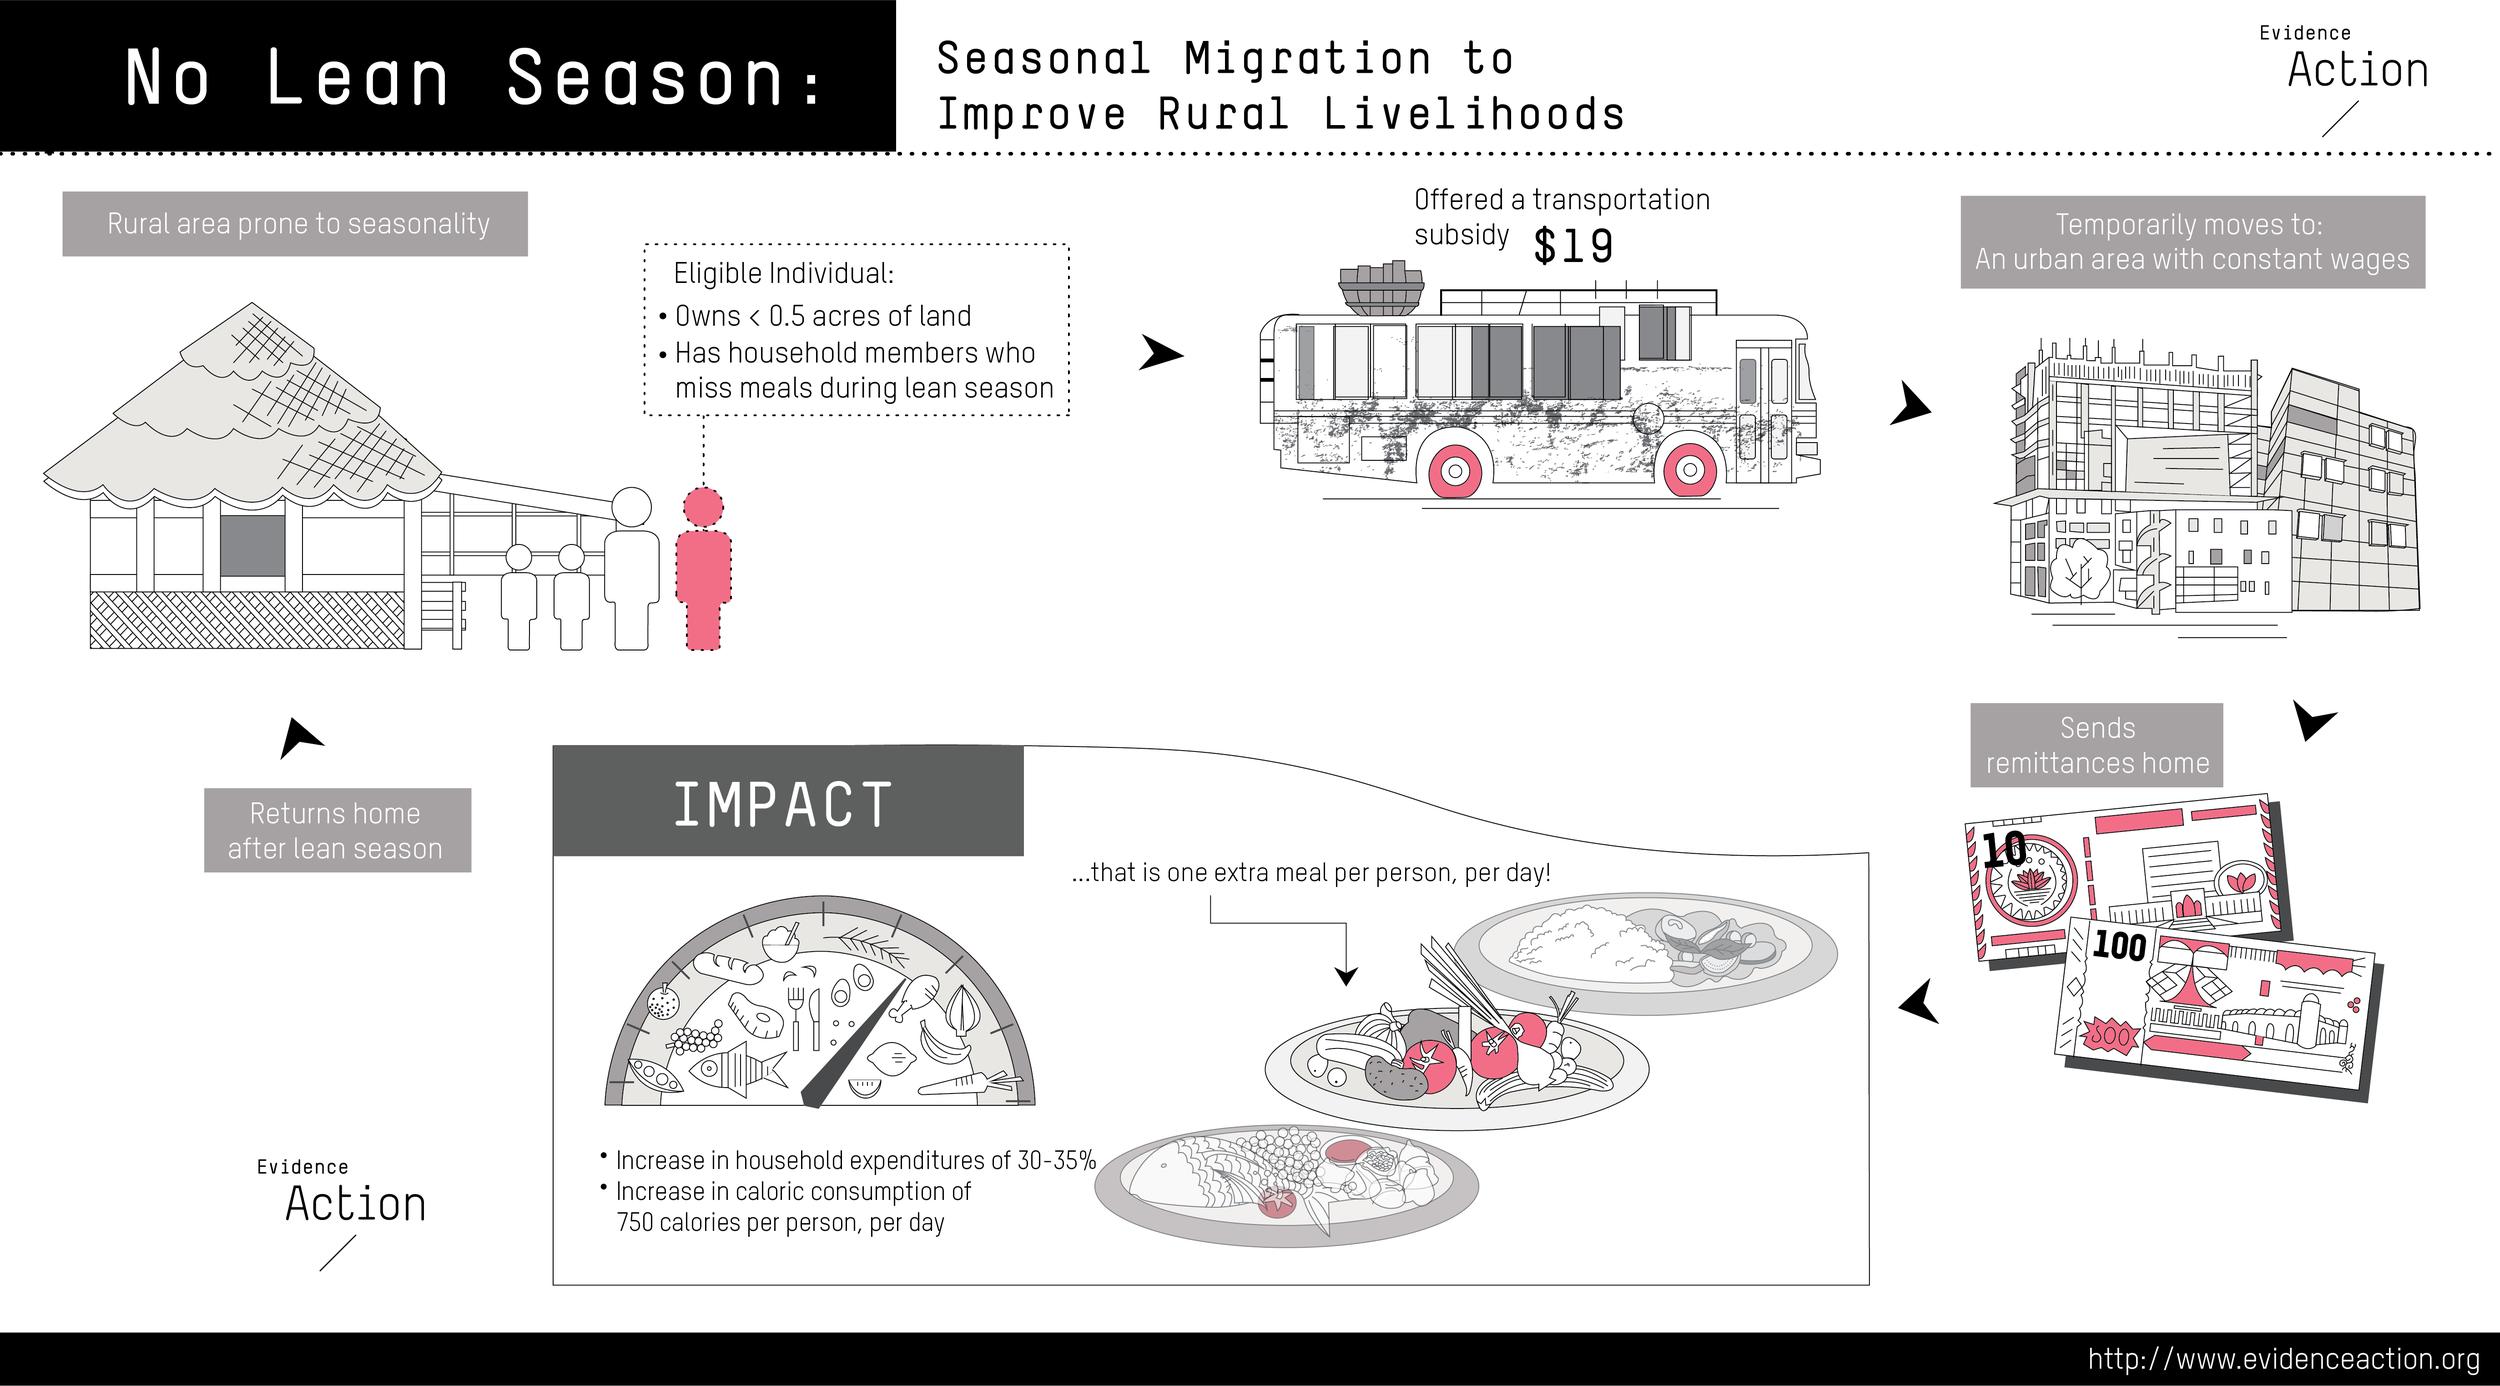 infographic_noleanseason 2-1-2017-02.png